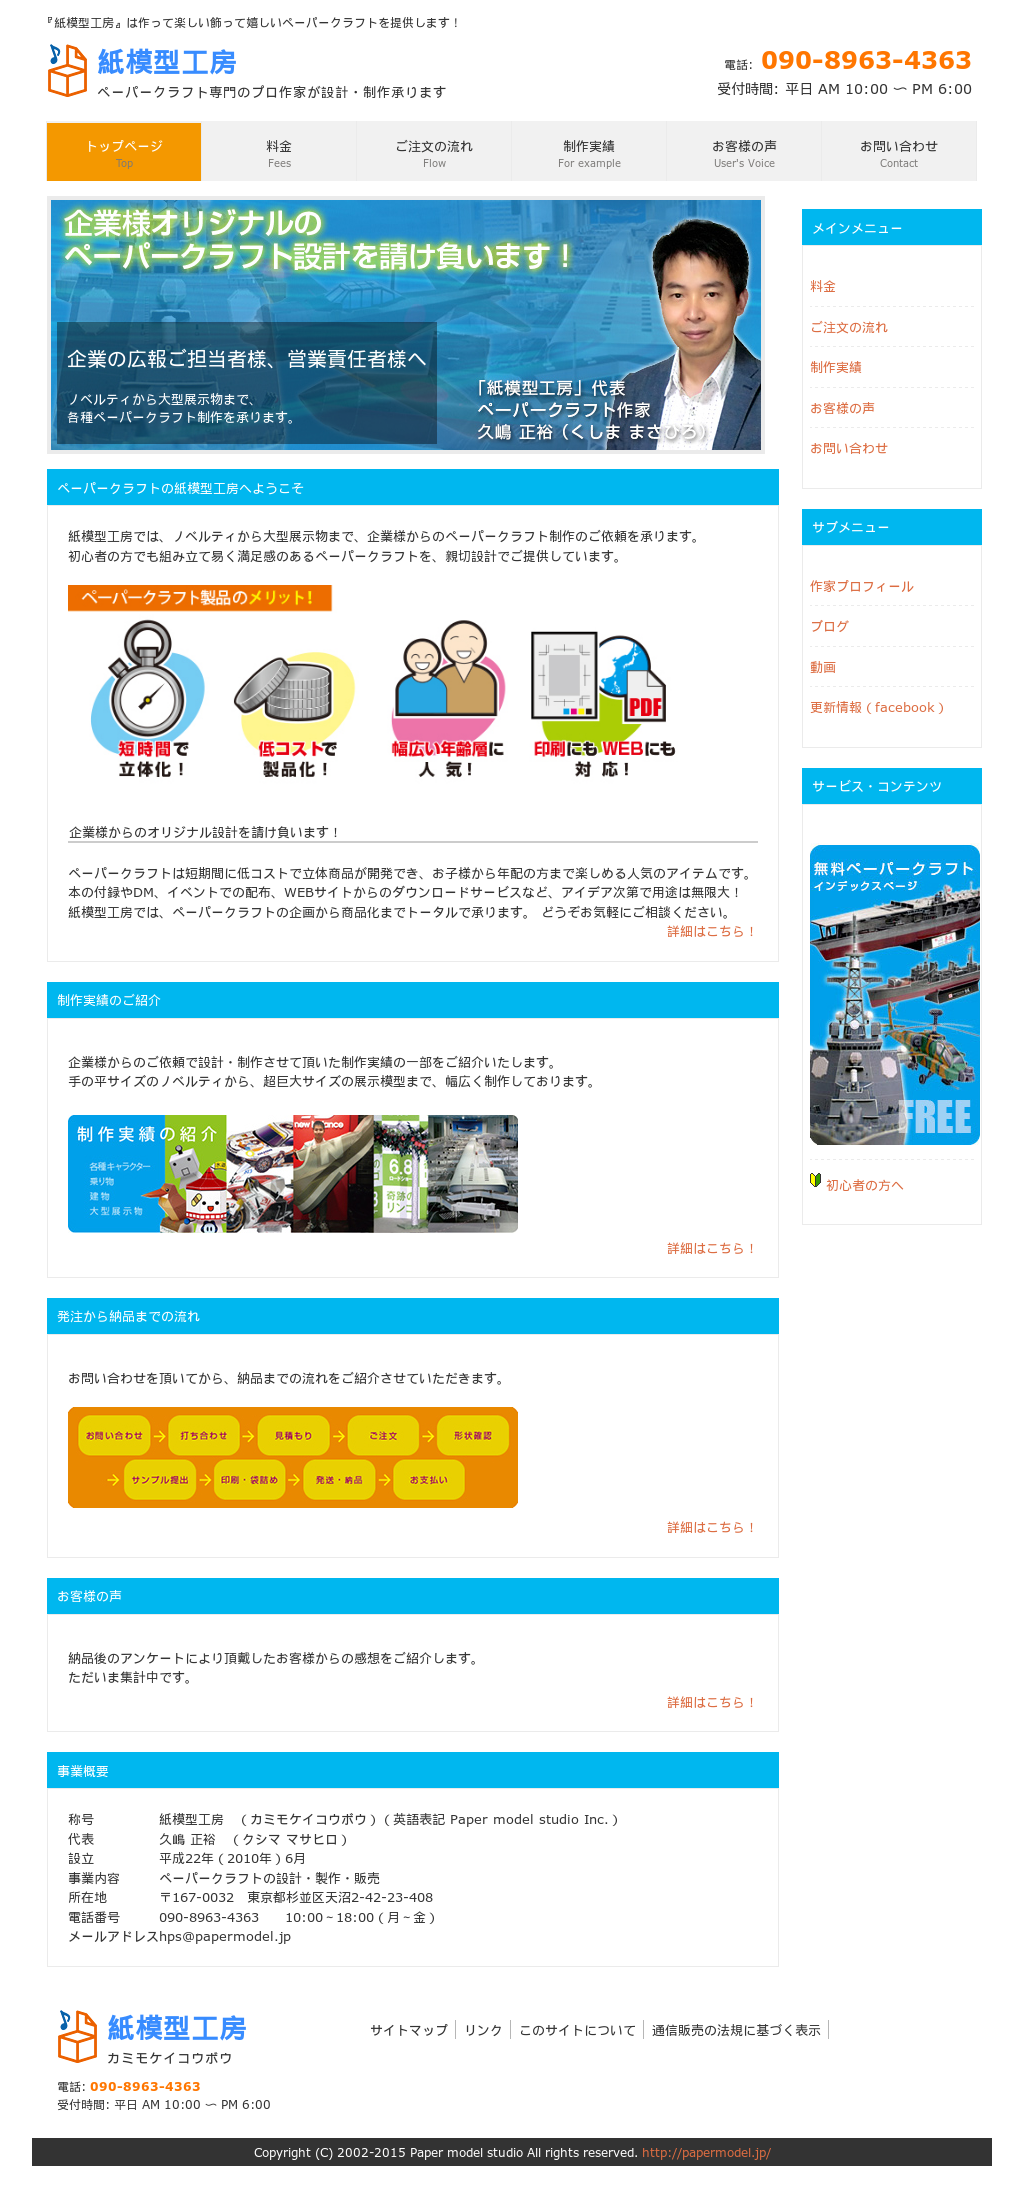 Paper Model Studio Competitors, Revenue and Employees